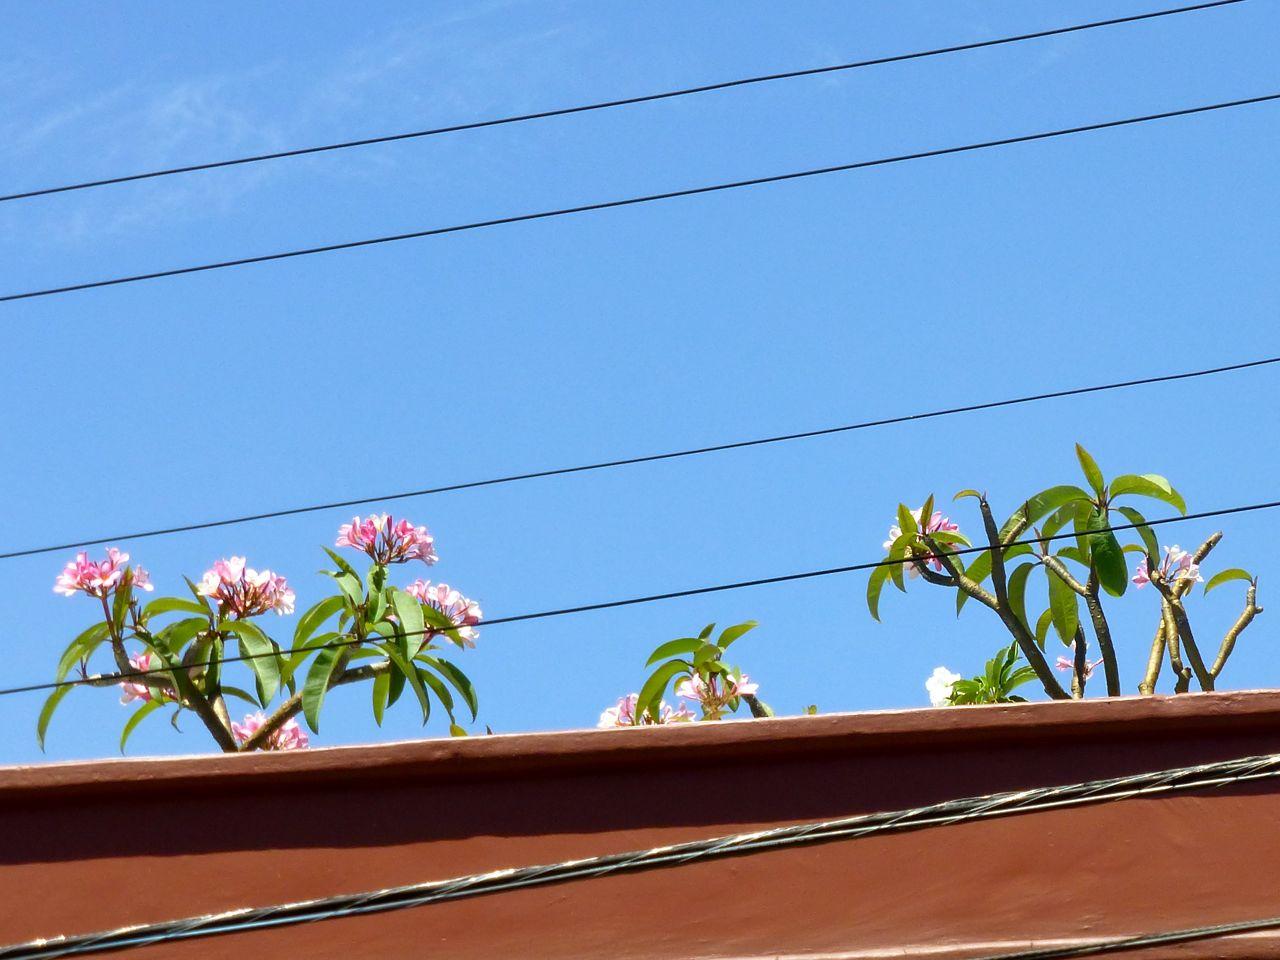 Flor de mayo; May Flower